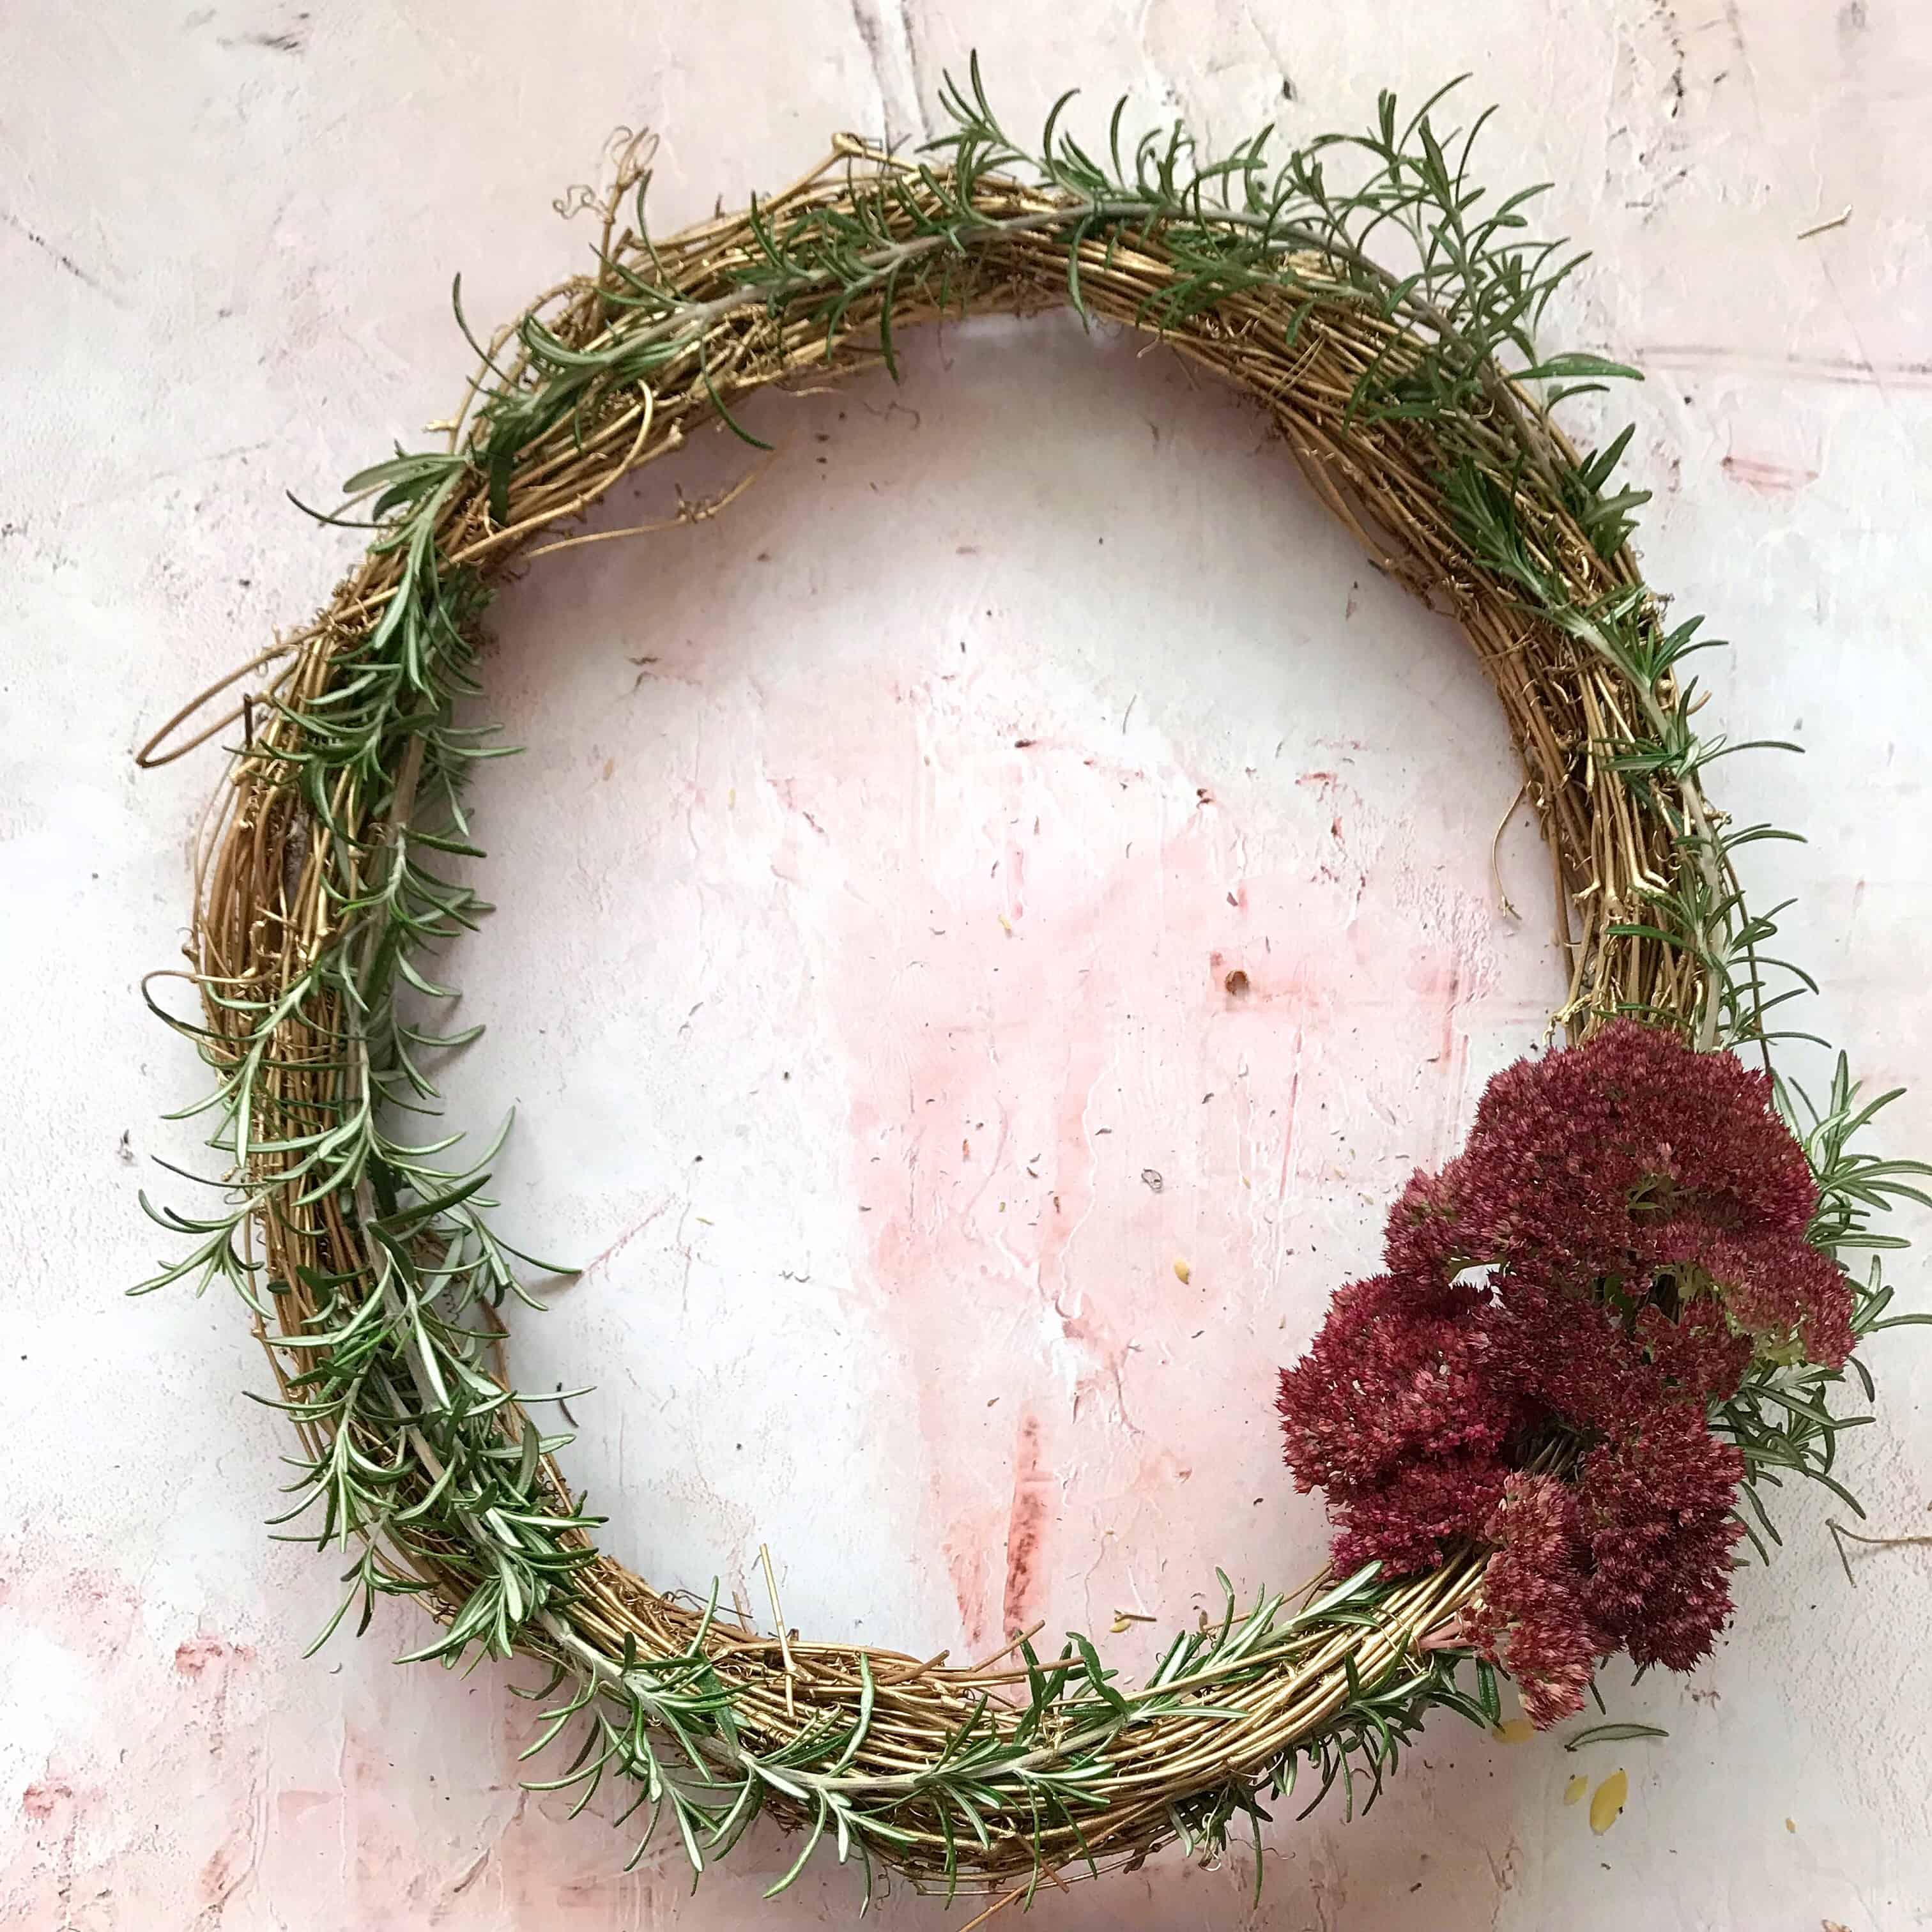 Step 4 to make an easy metallic wreath - attach flowers